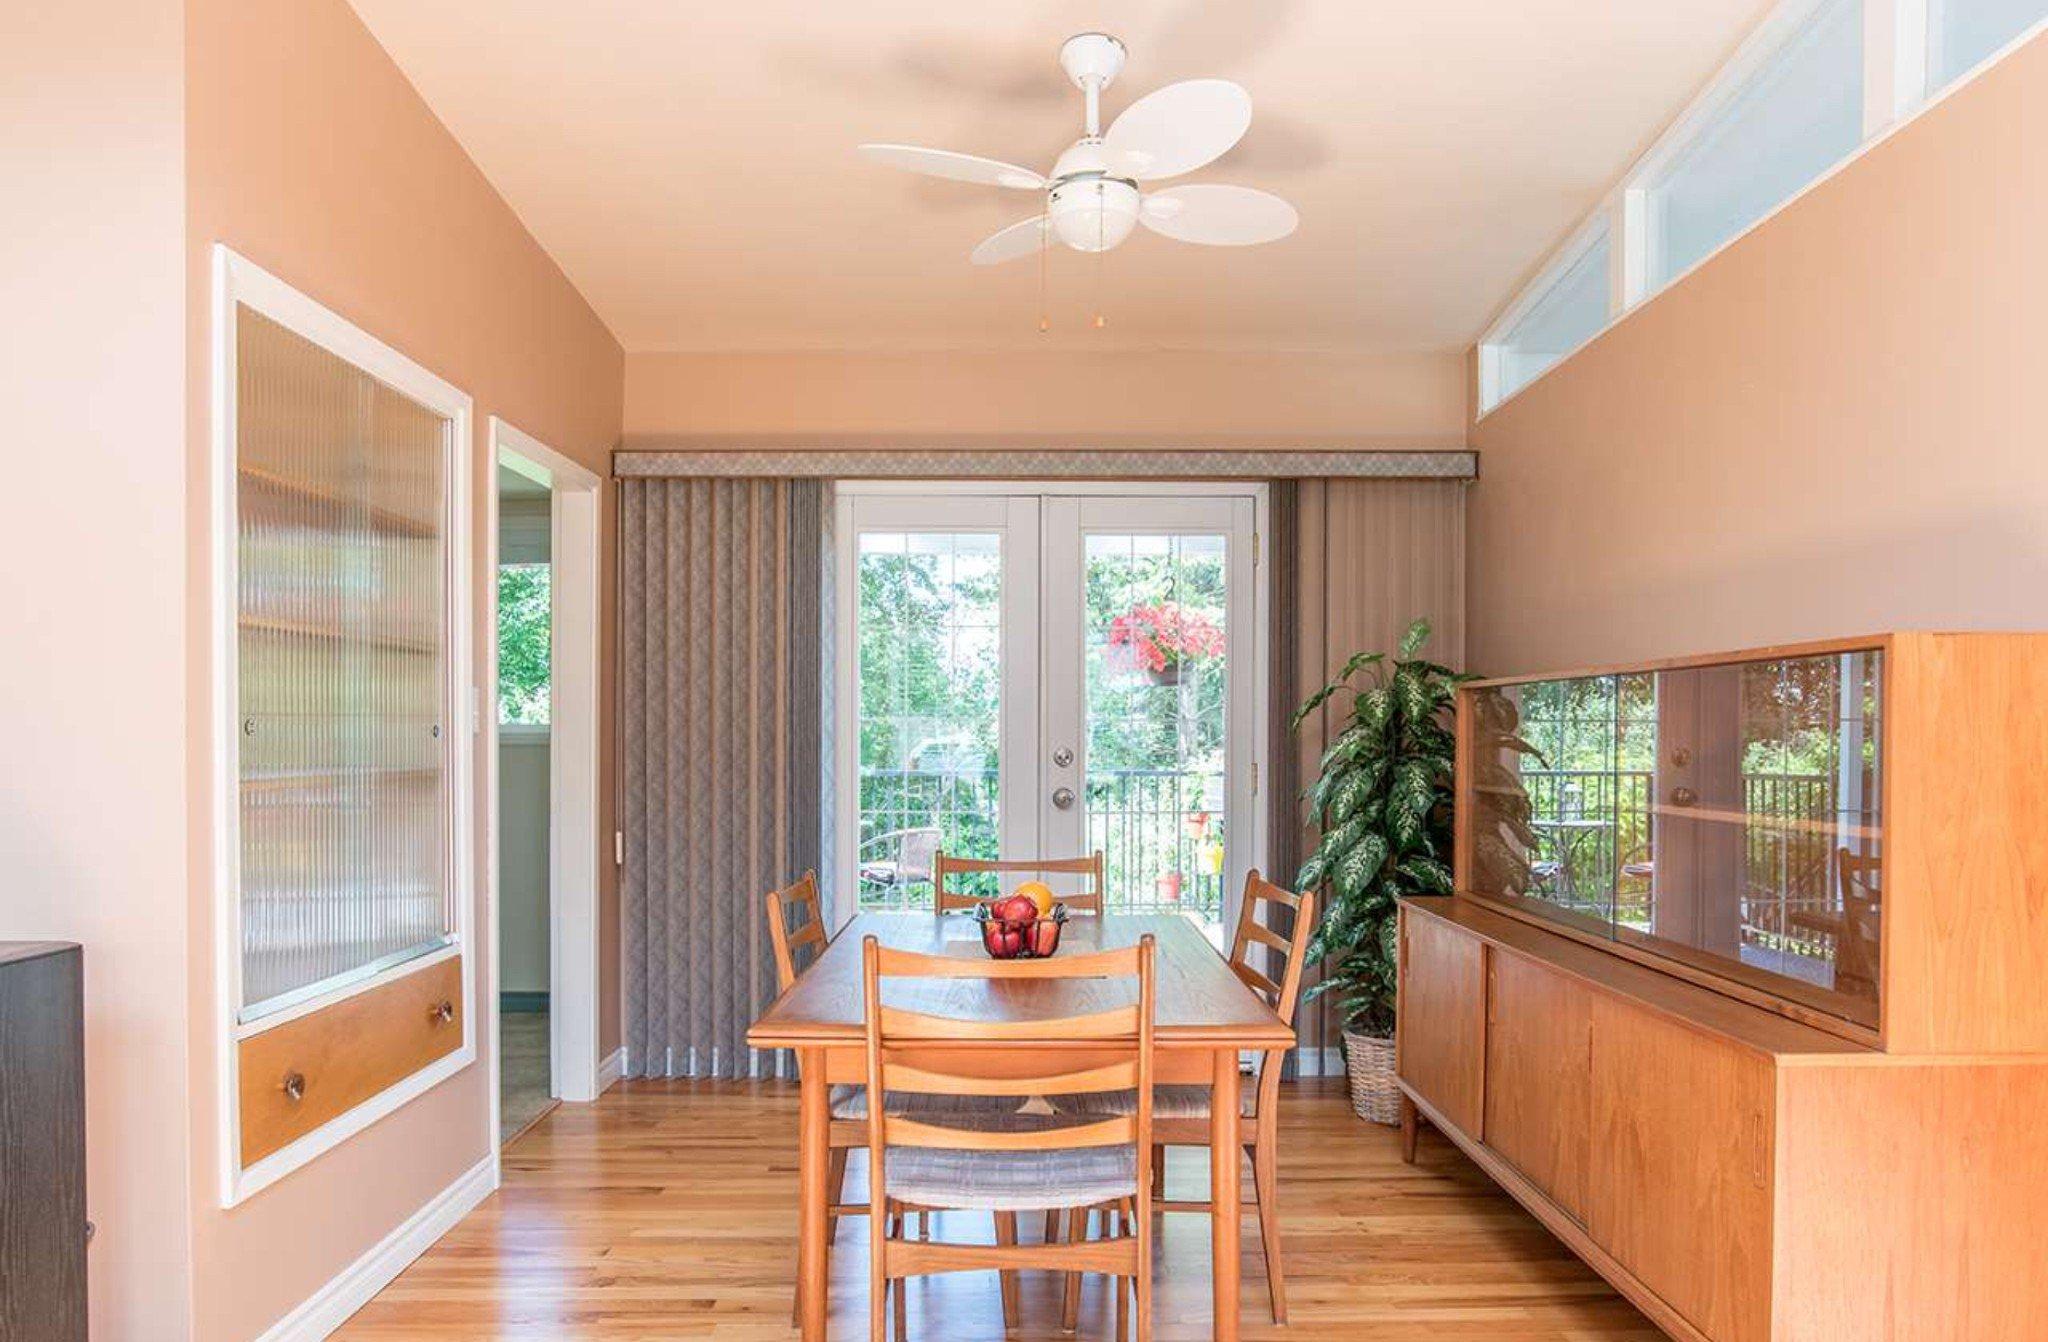 Photo 6: Photos: 10327 127A Street in Surrey: Cedar Hills House for sale : MLS®# R2178137